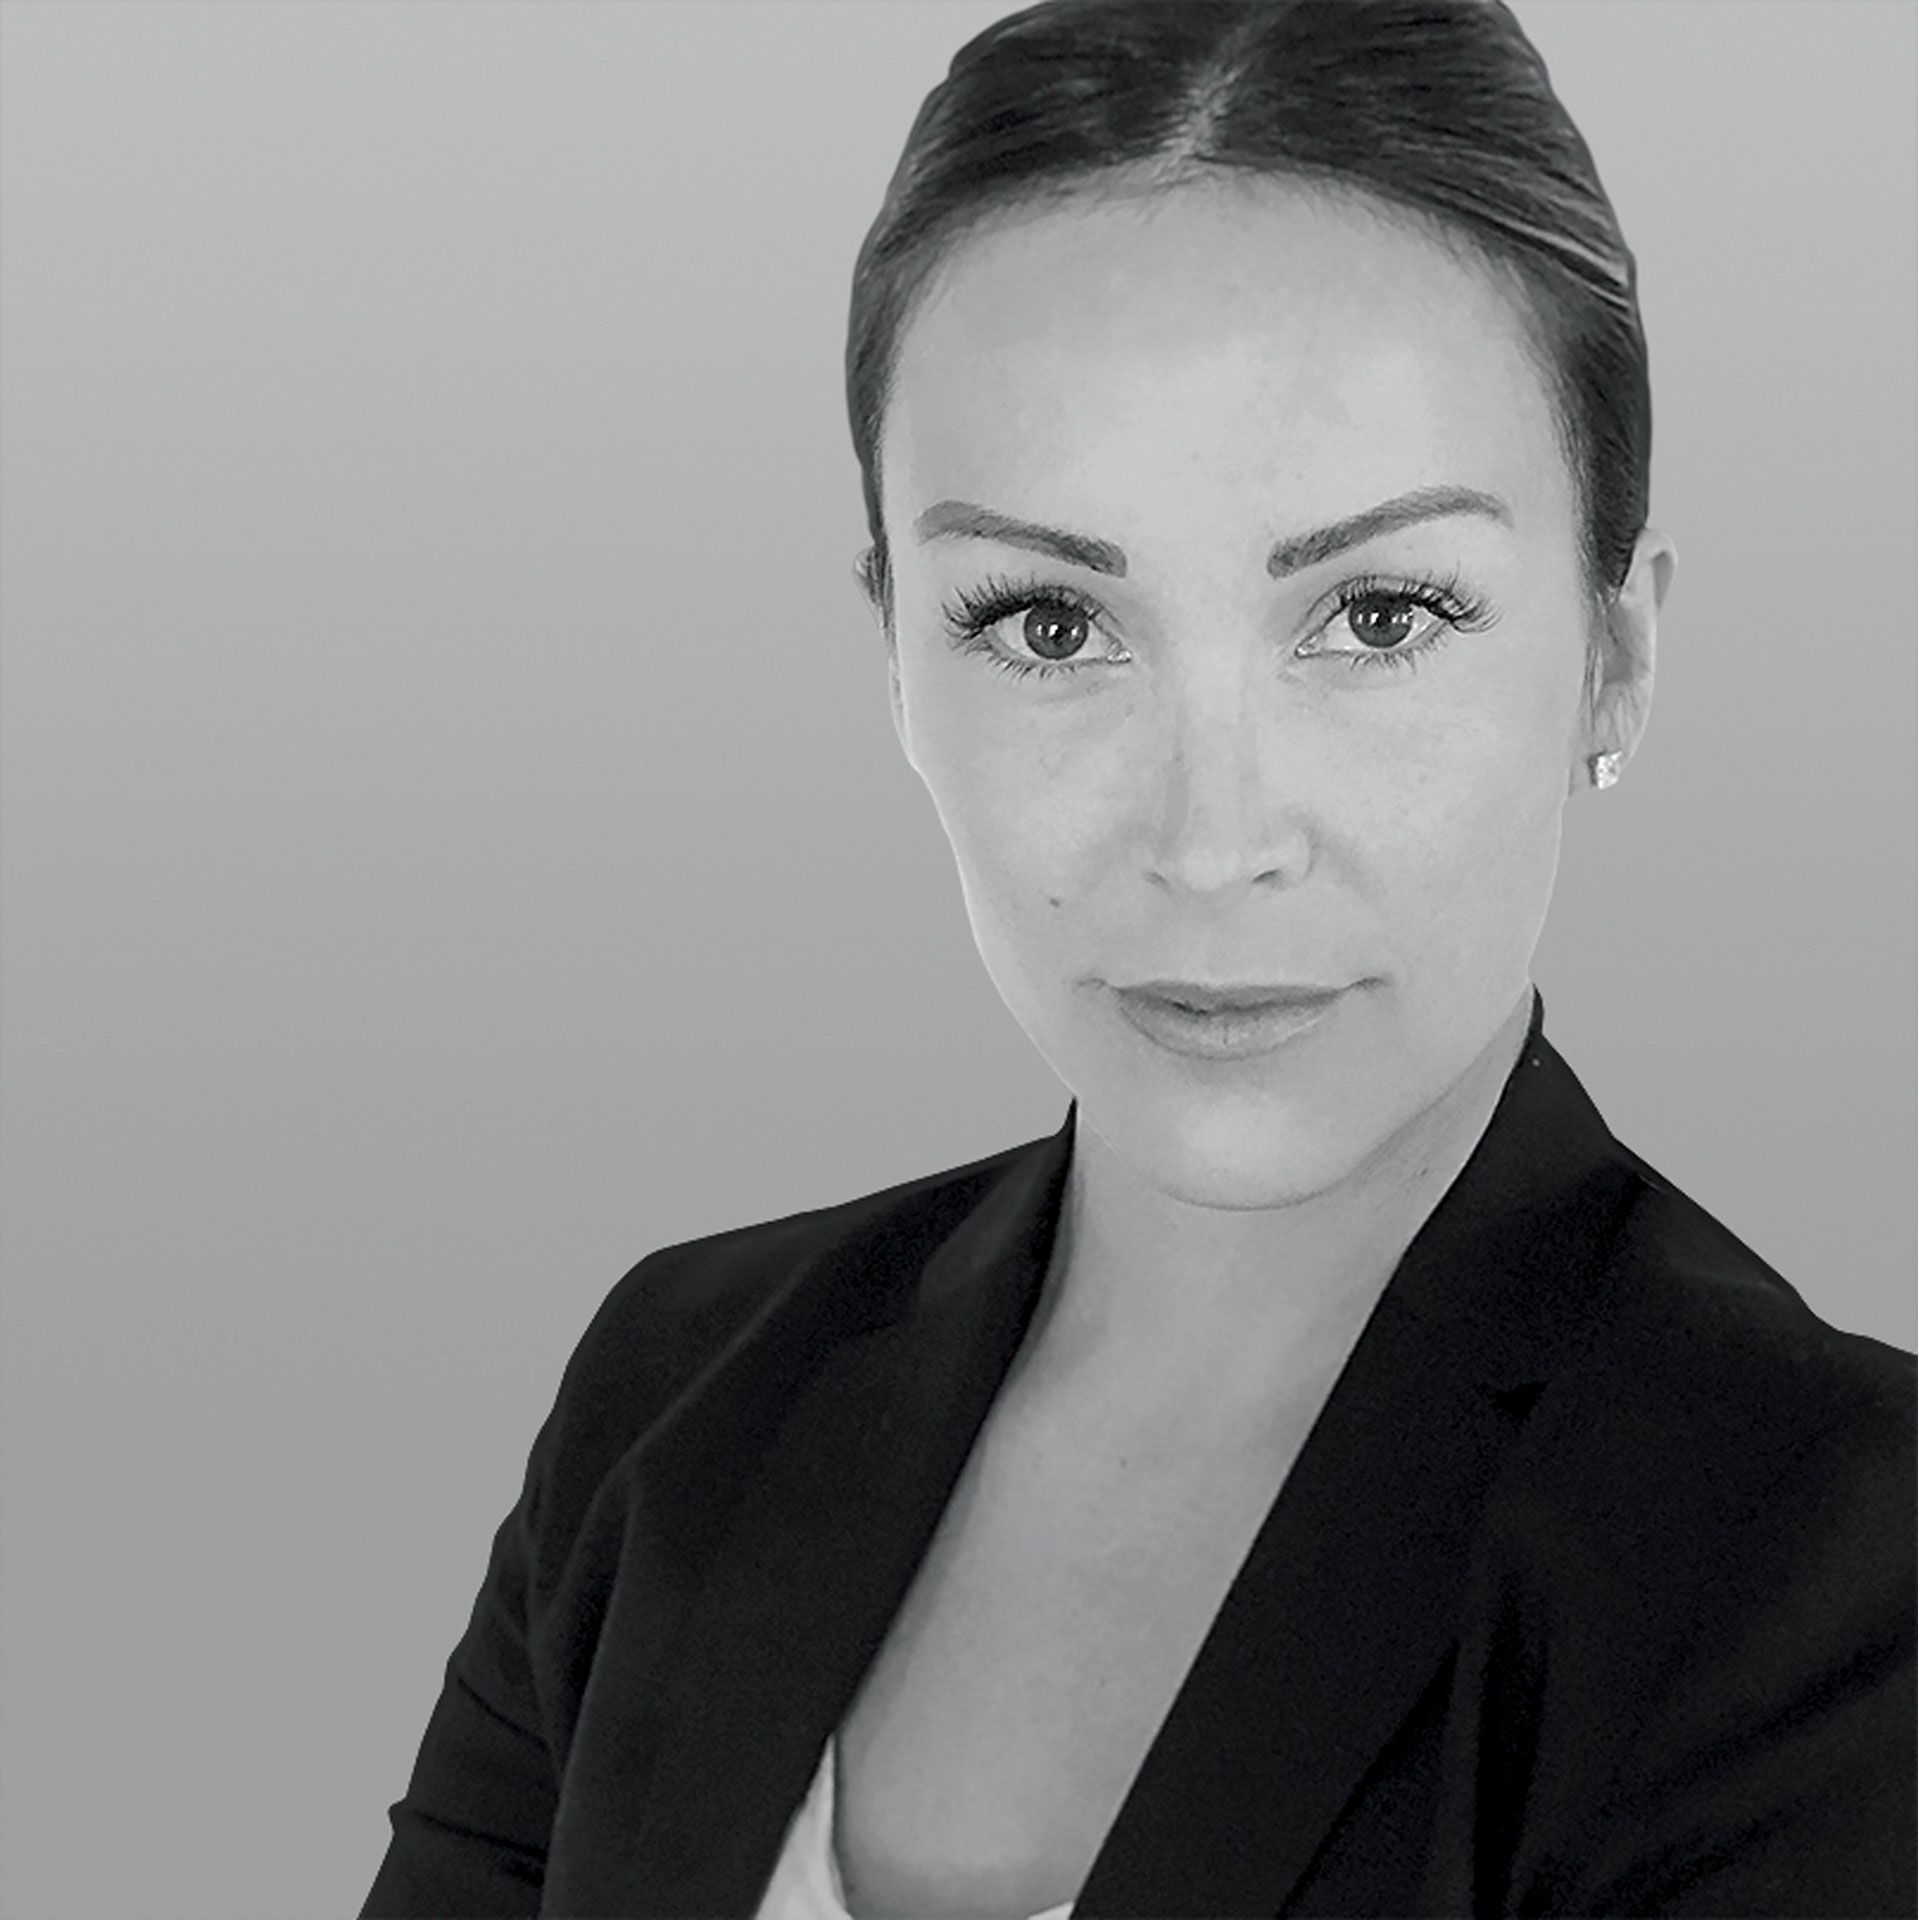 Jessica Pathy